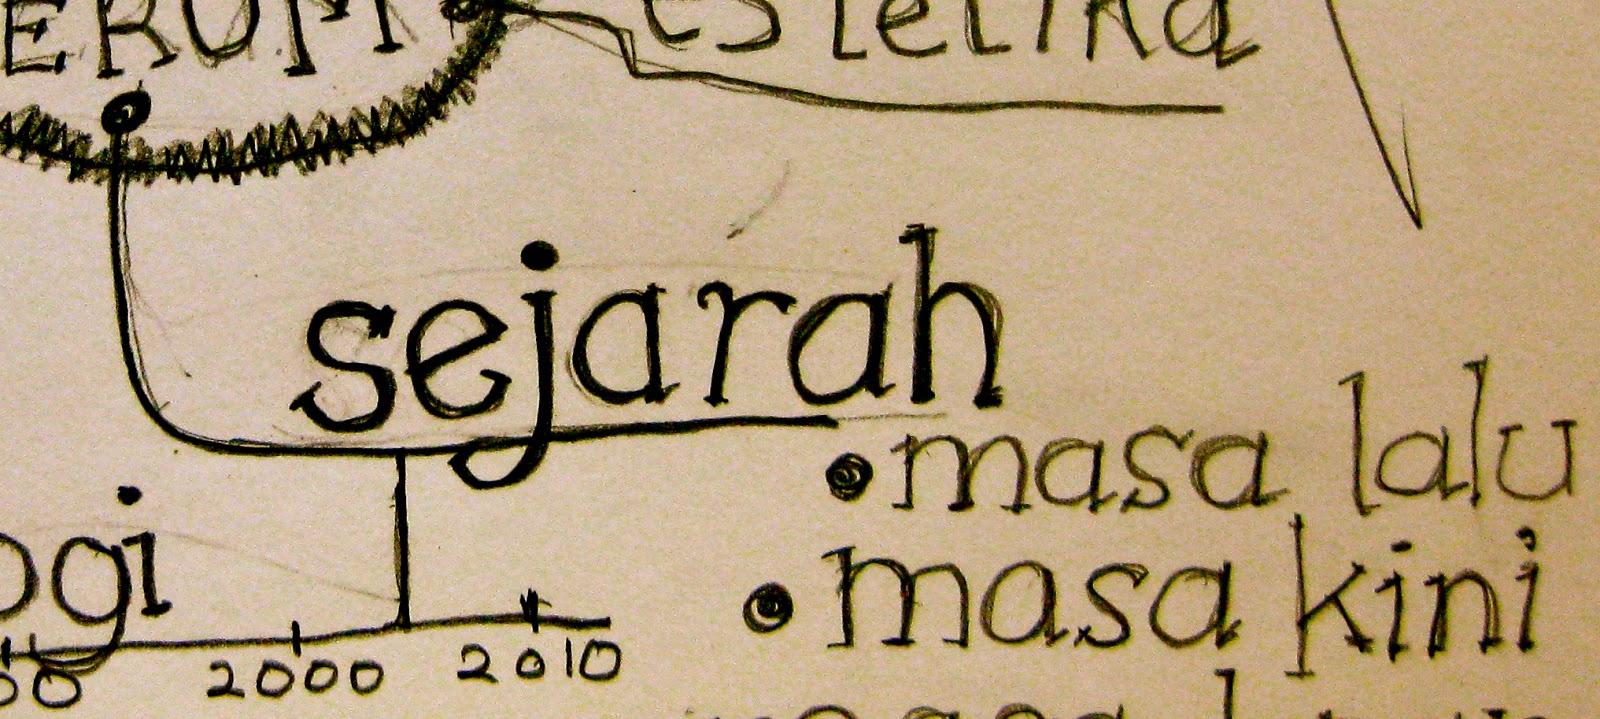 Pengertian Sejarah Berdasarkan asal-usul Kata